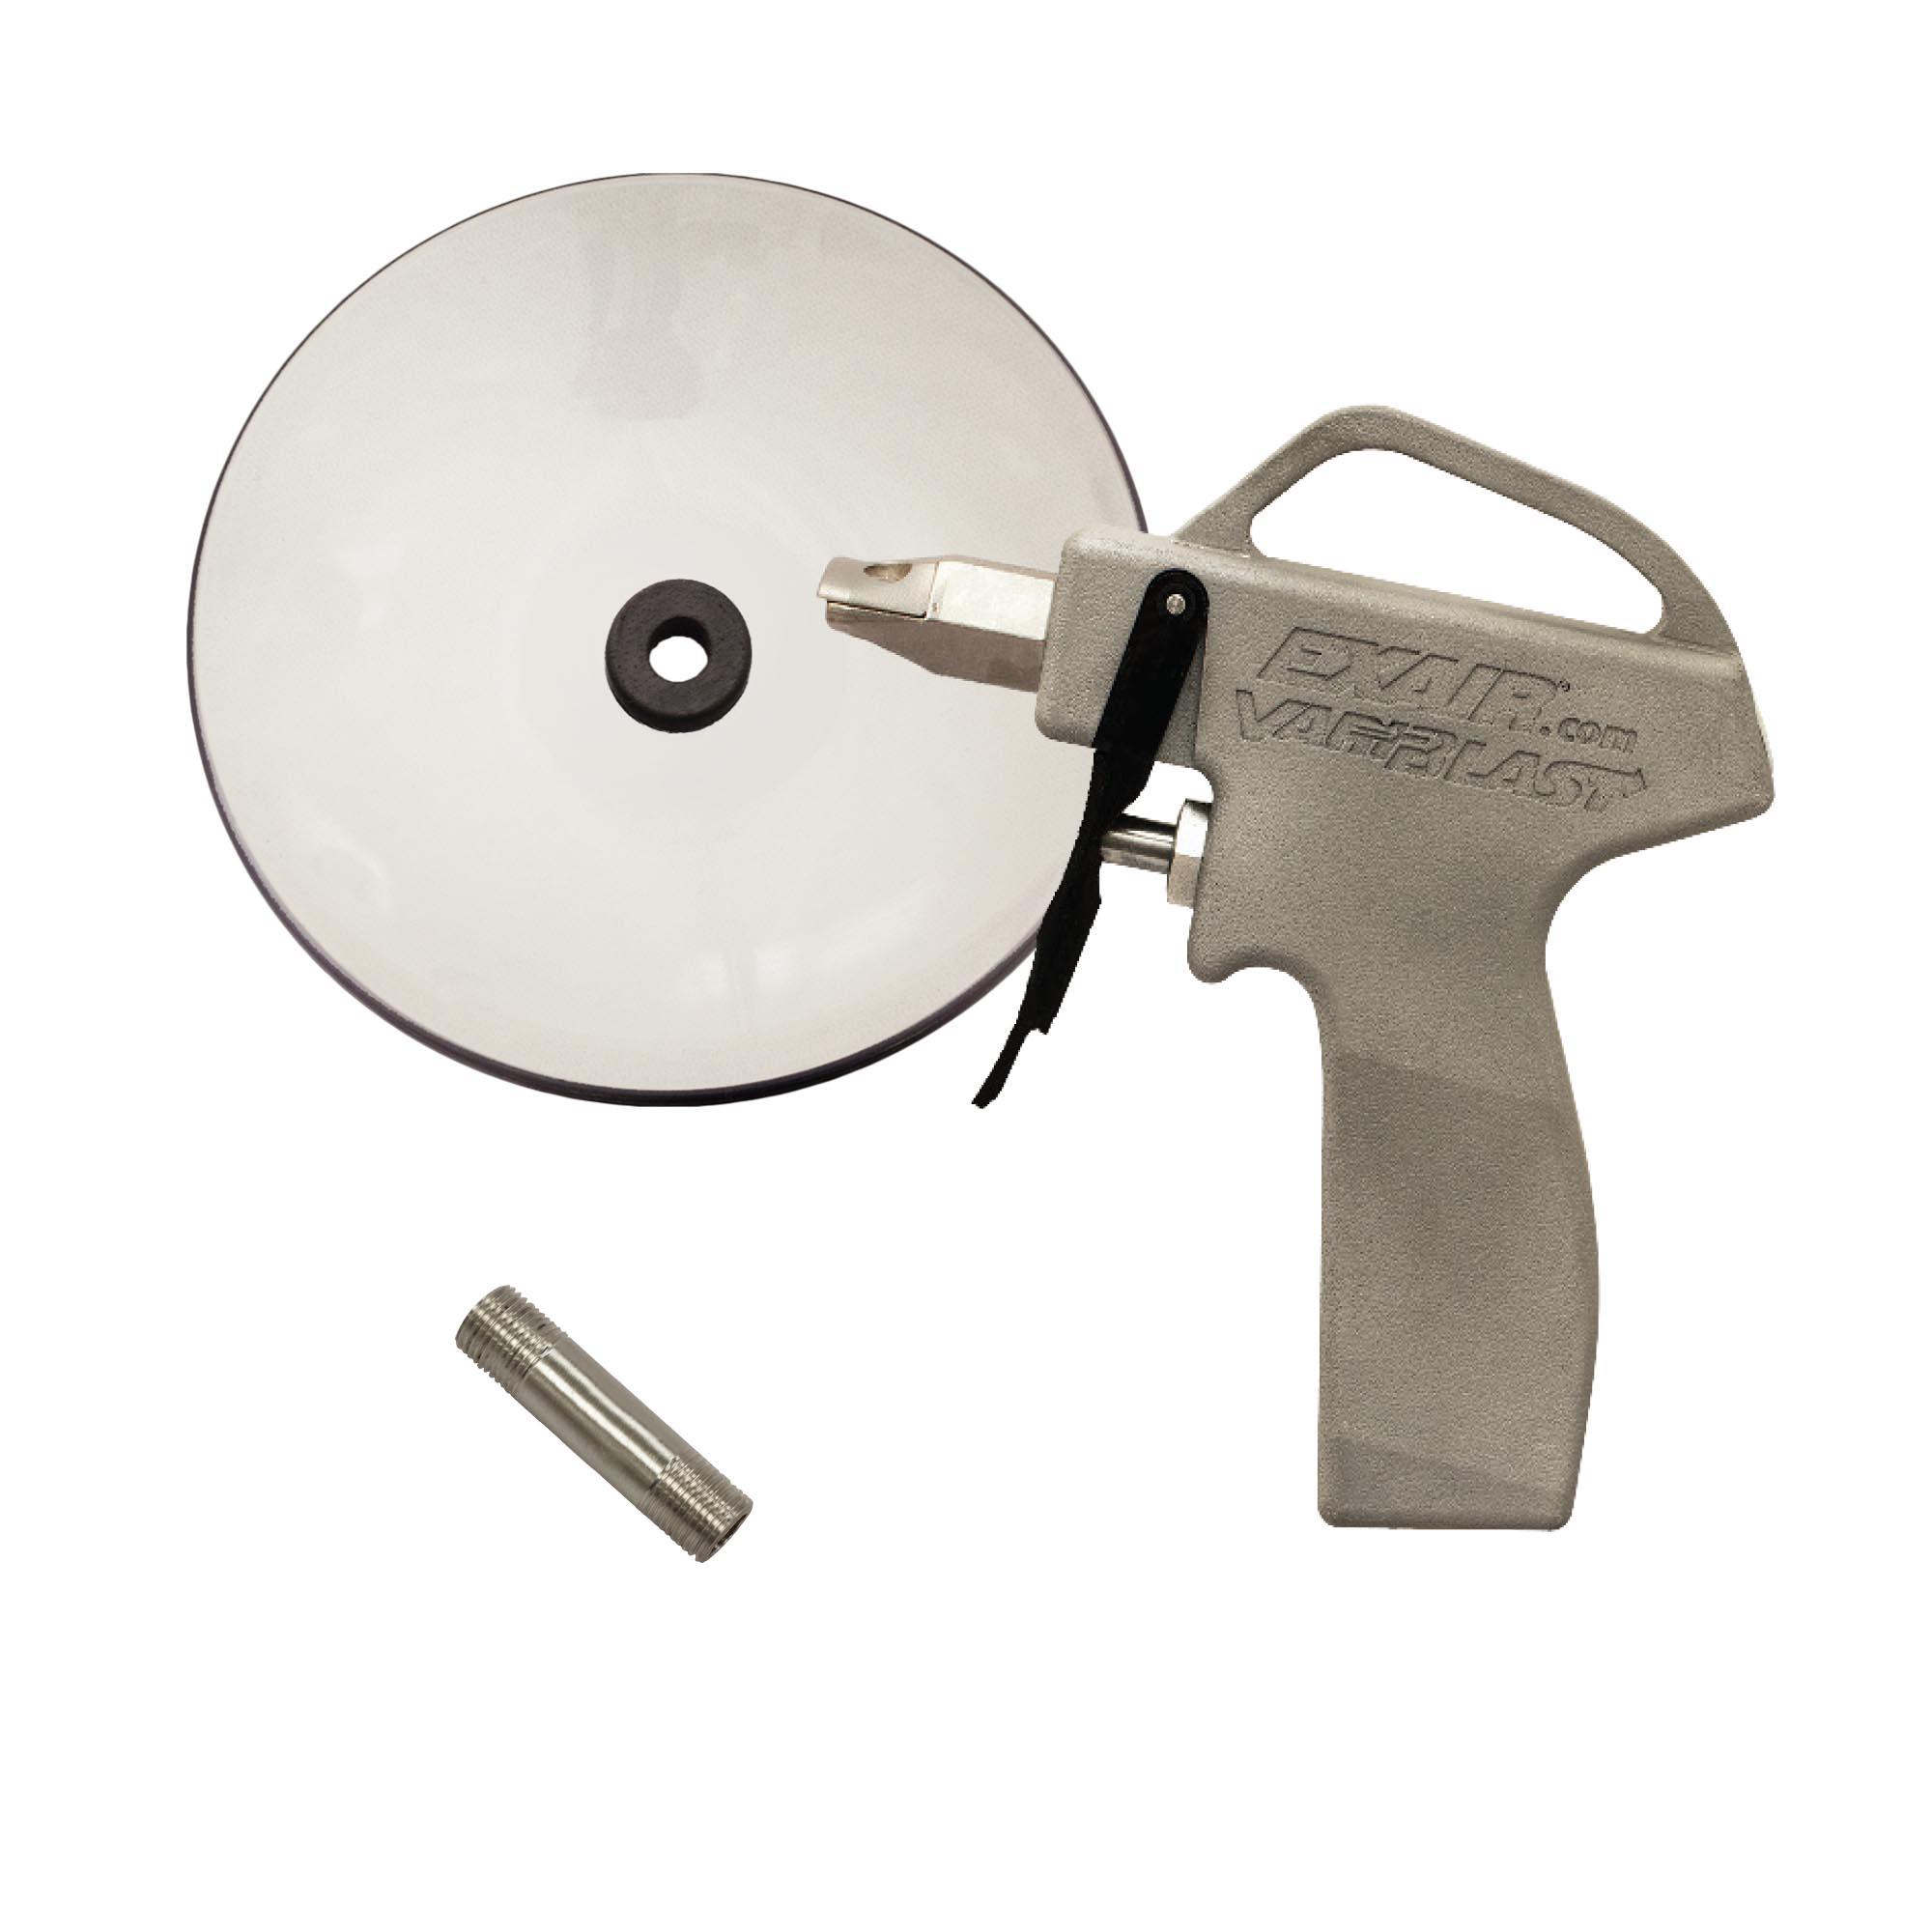 "Model 1629-CS VariBlast Compact Safety Air Gun with 1"" Flat Super Air Nozzle and Chip Shield"